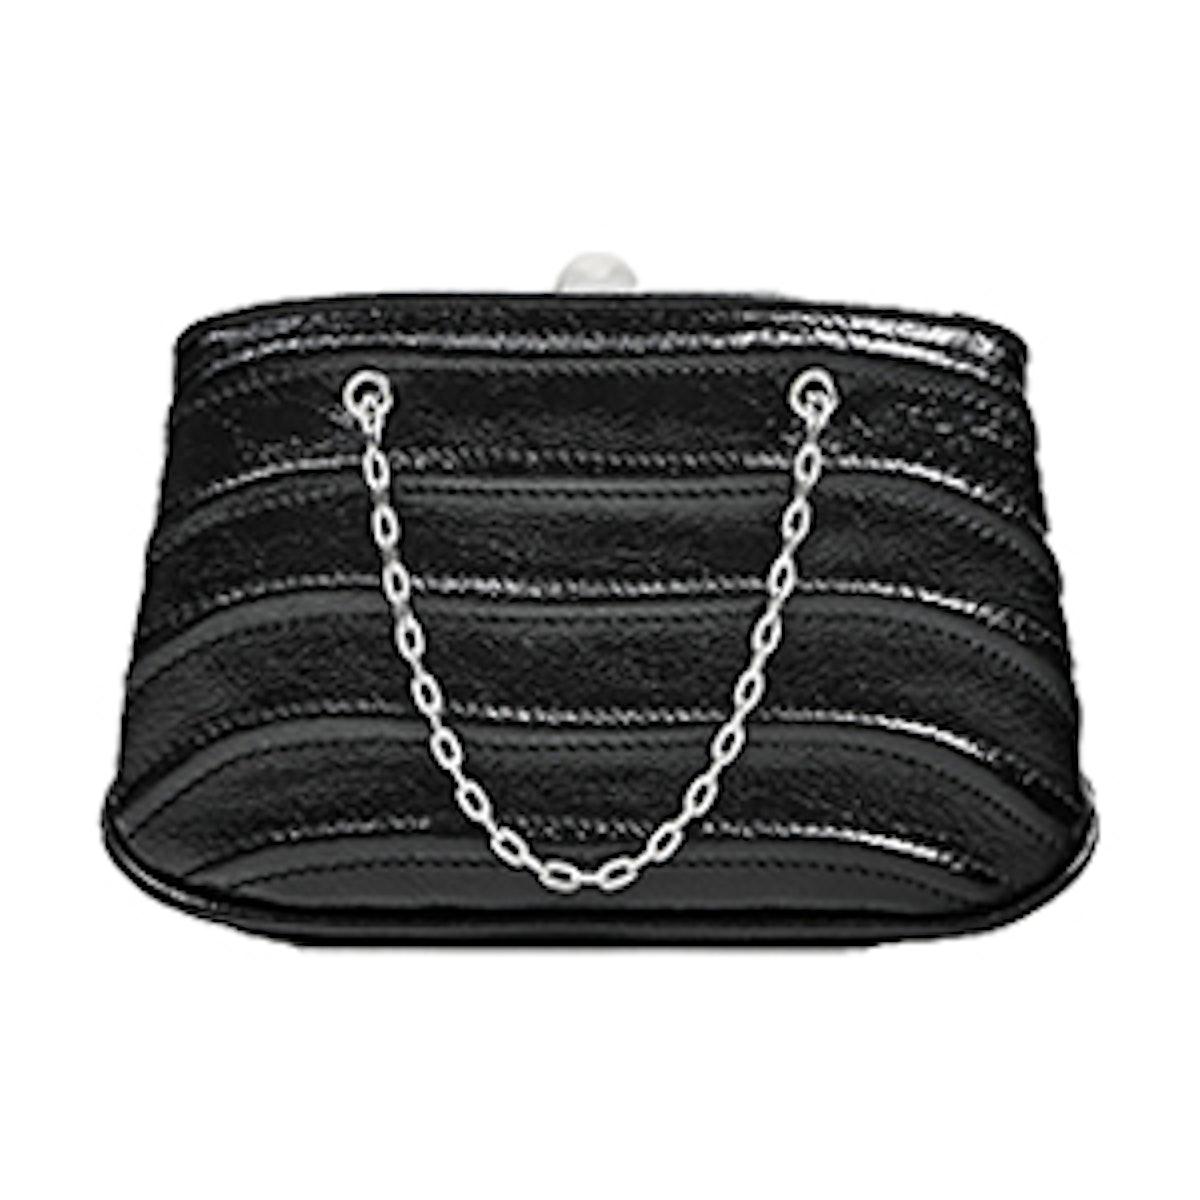 Mini Crossbody Bag With Chain